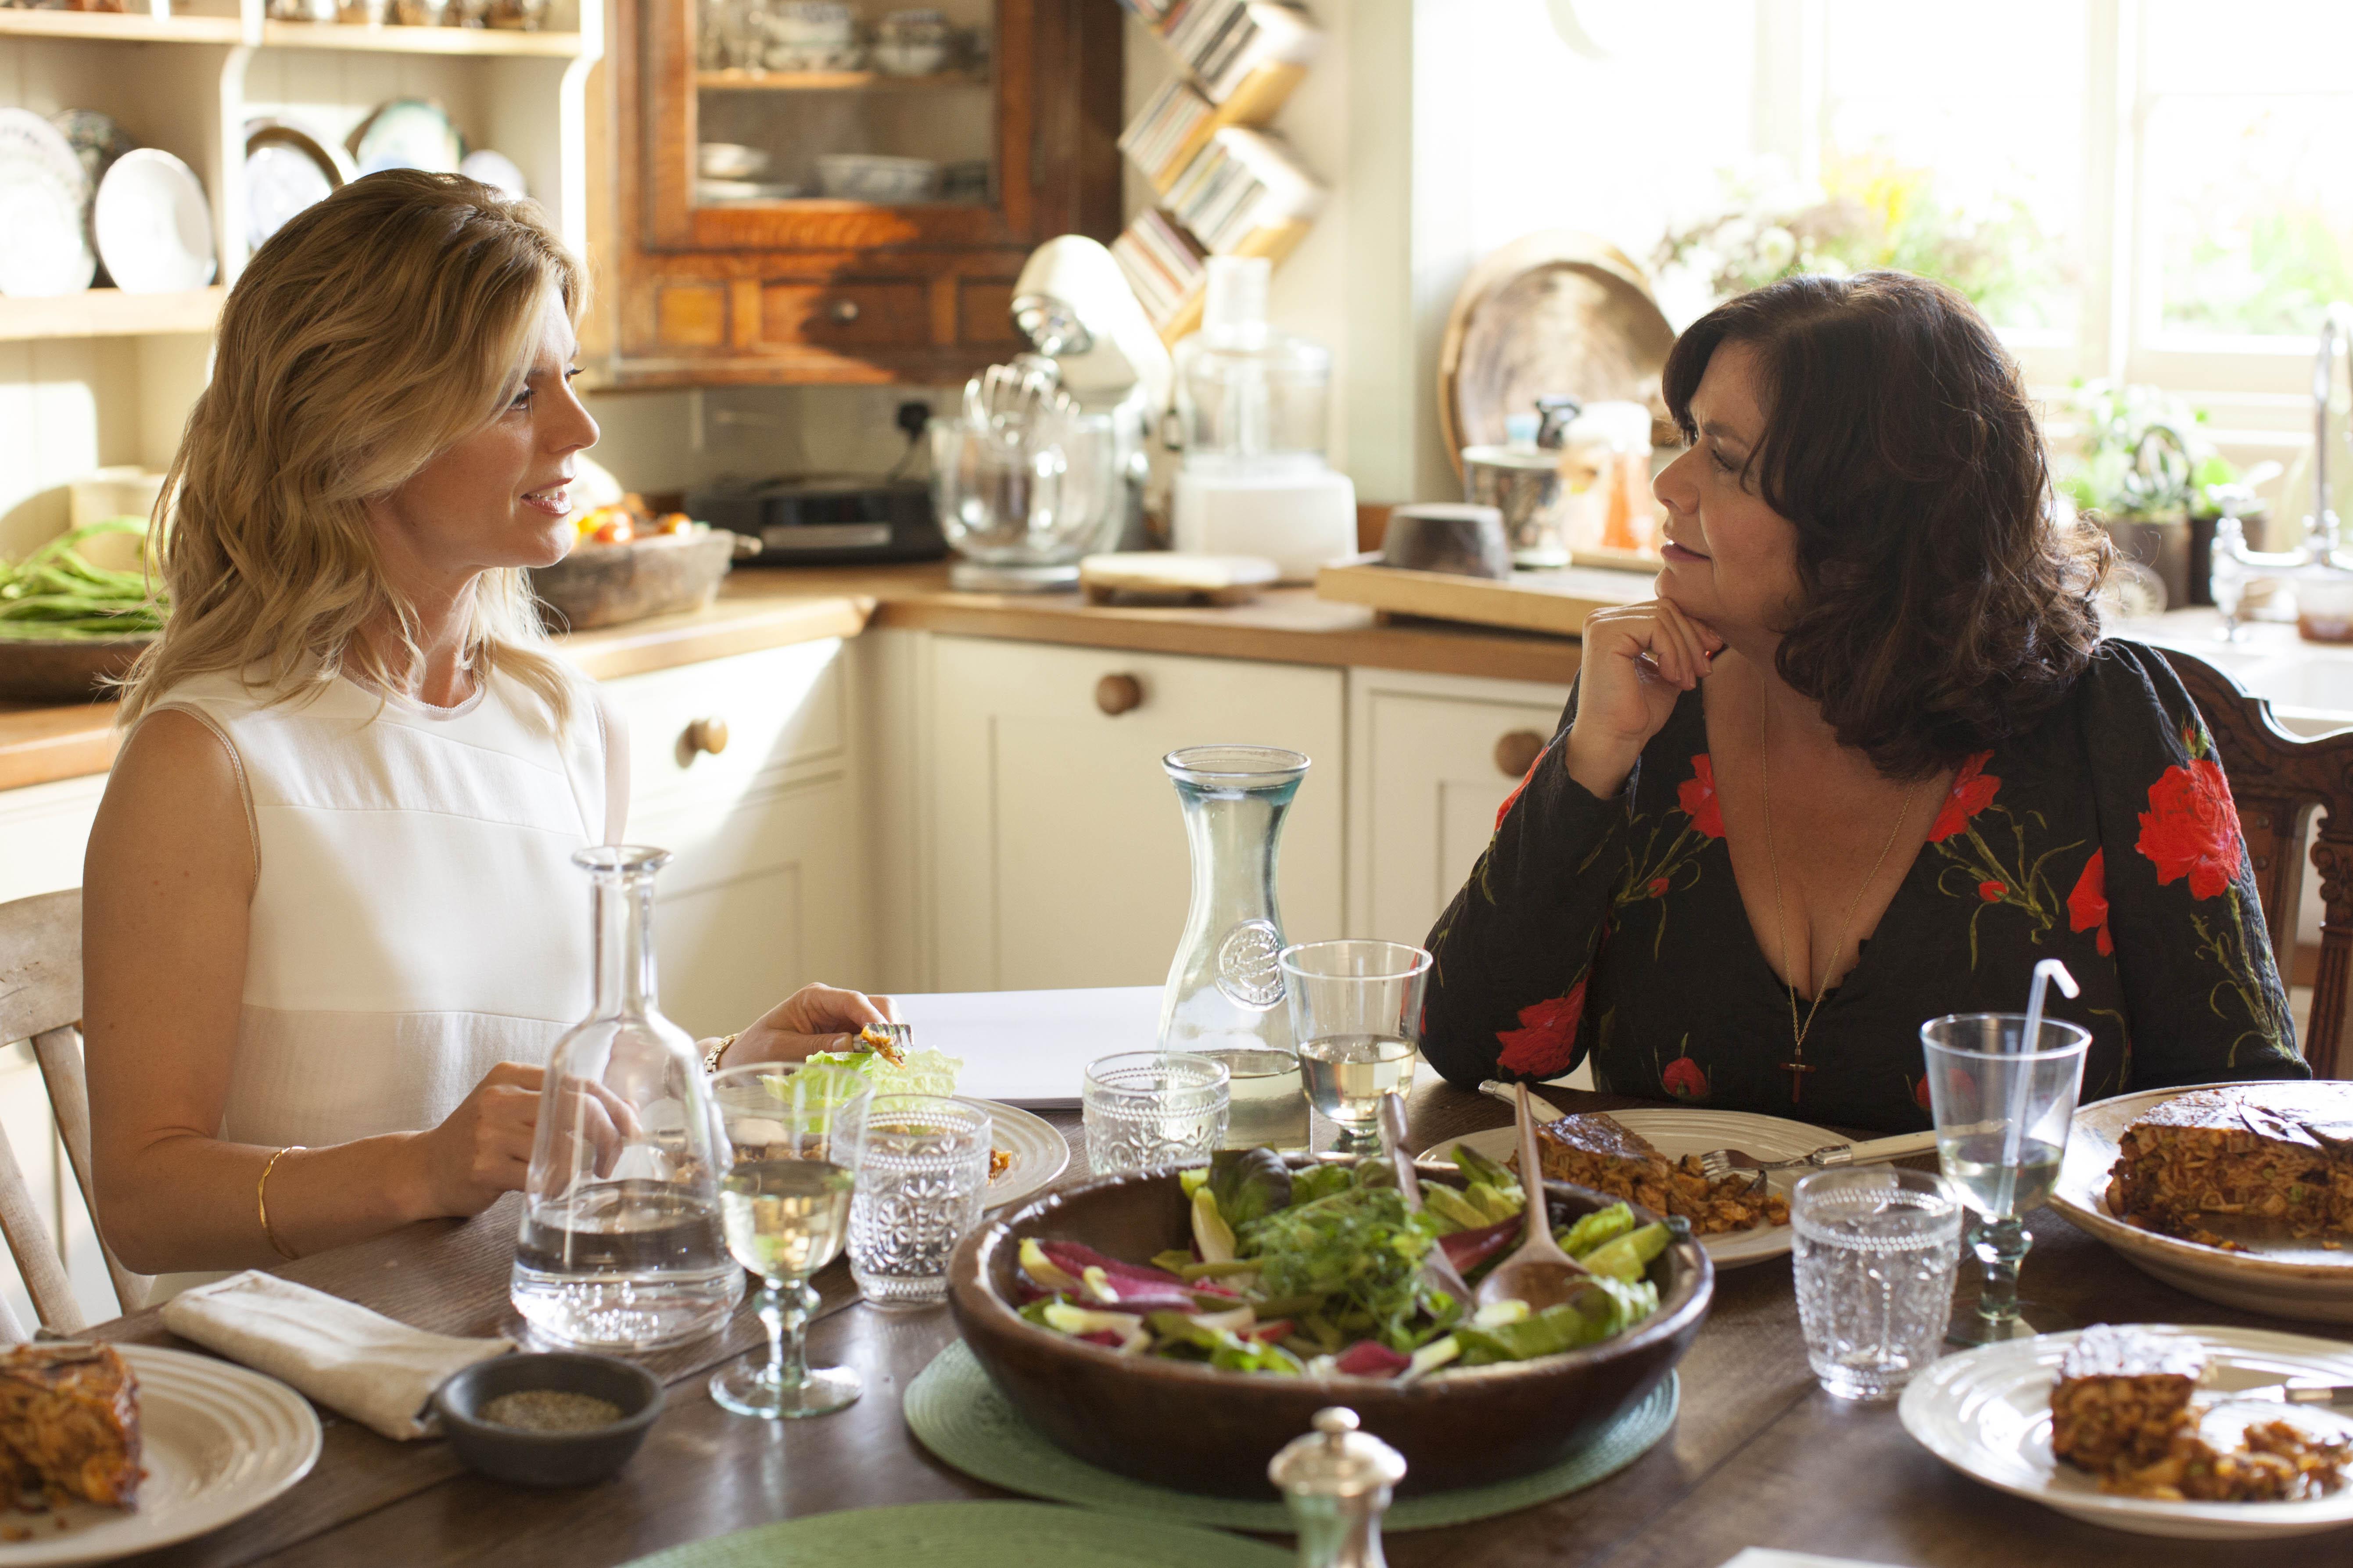 Delicious - Series 02  Episode 01  Emilia Fox as Sam and Dawn French as Gina. (Sky, BA)